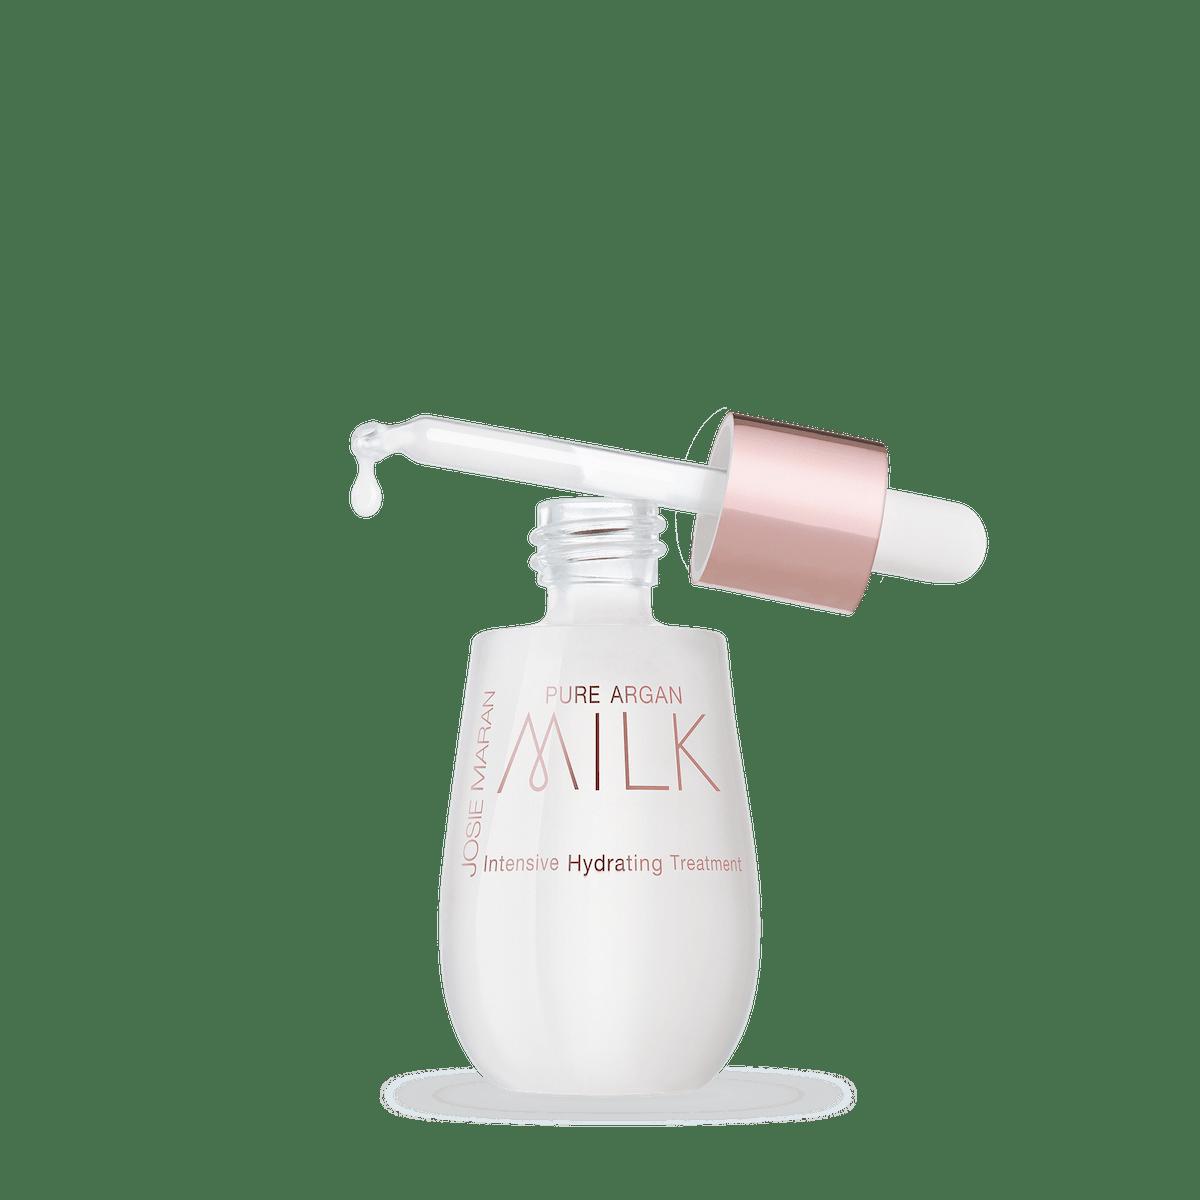 Pure Argan Milk Intensive Hydrating Treatment